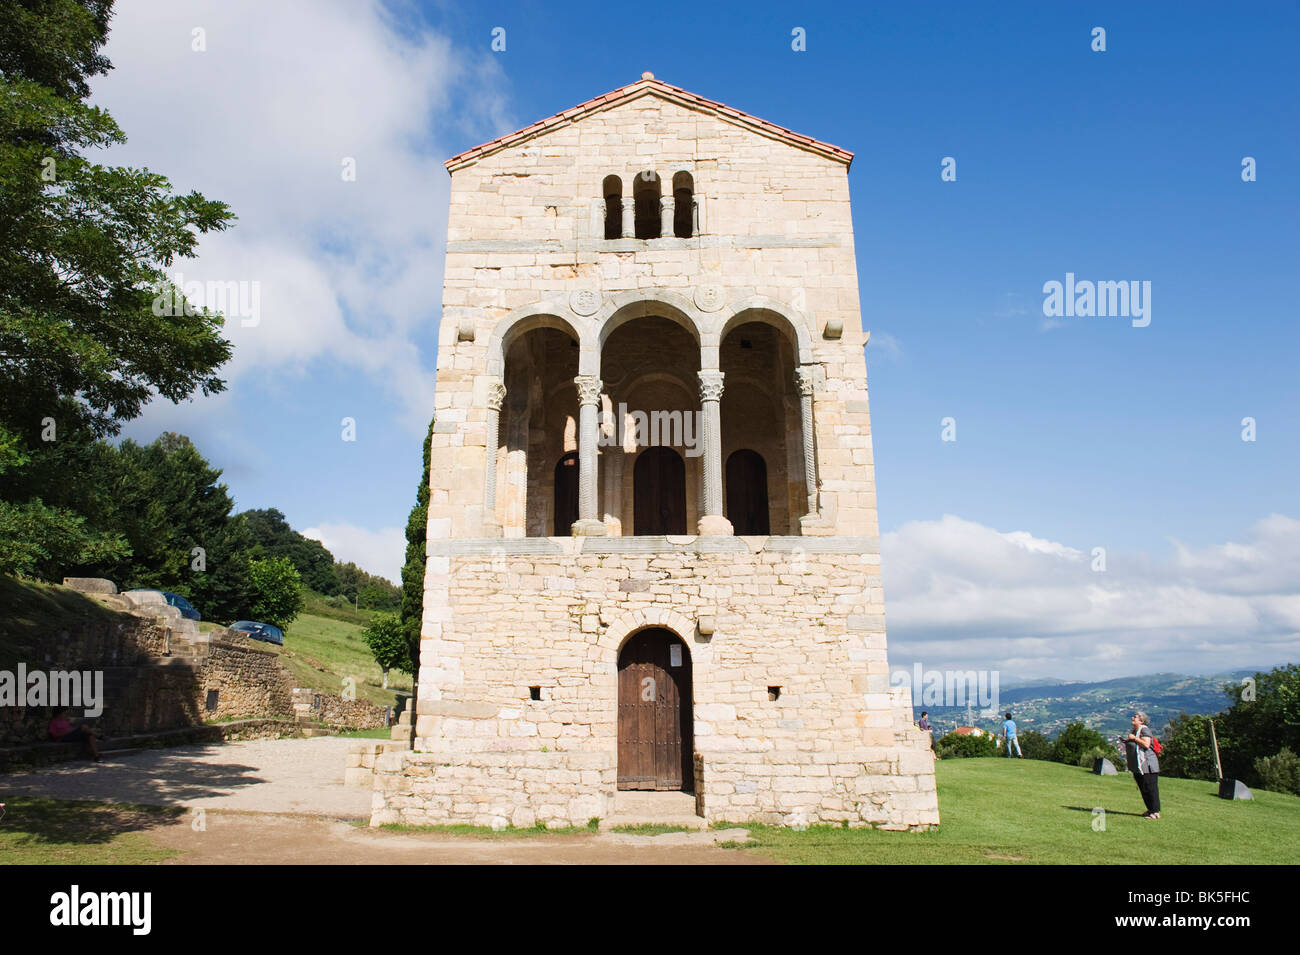 Santa Maria de Naranco, 9th century pre-romanesque style, UNESCO World Heritage Site, Oviedo, Spain, Europe Stock Photo